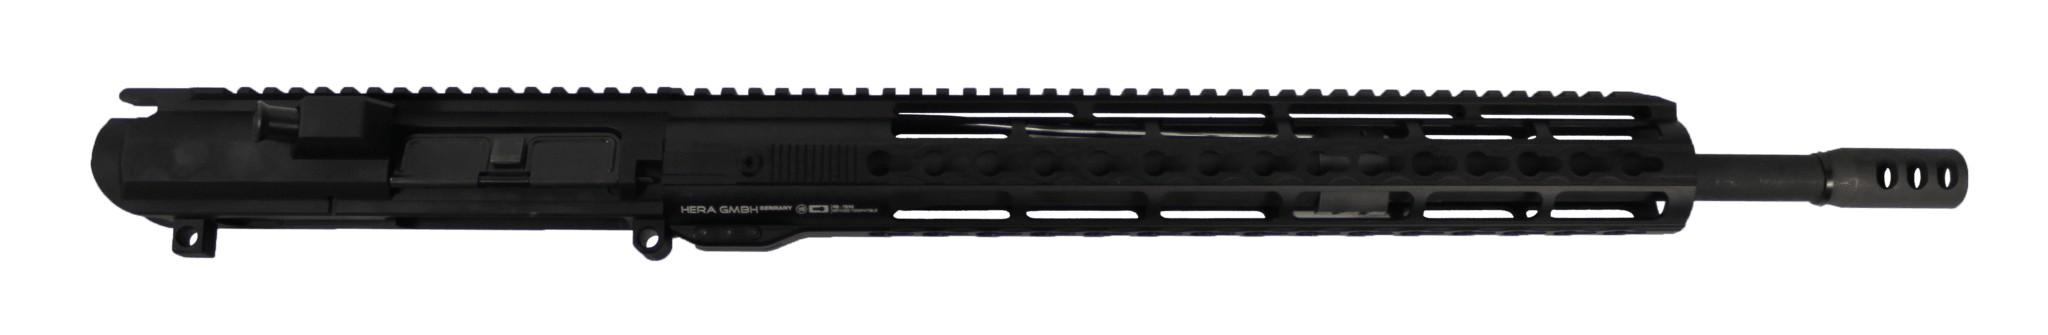 ar 10 complete upper assembly w bcg chh 18 308 win 15 hera arms keymod ar 10 handguard rail